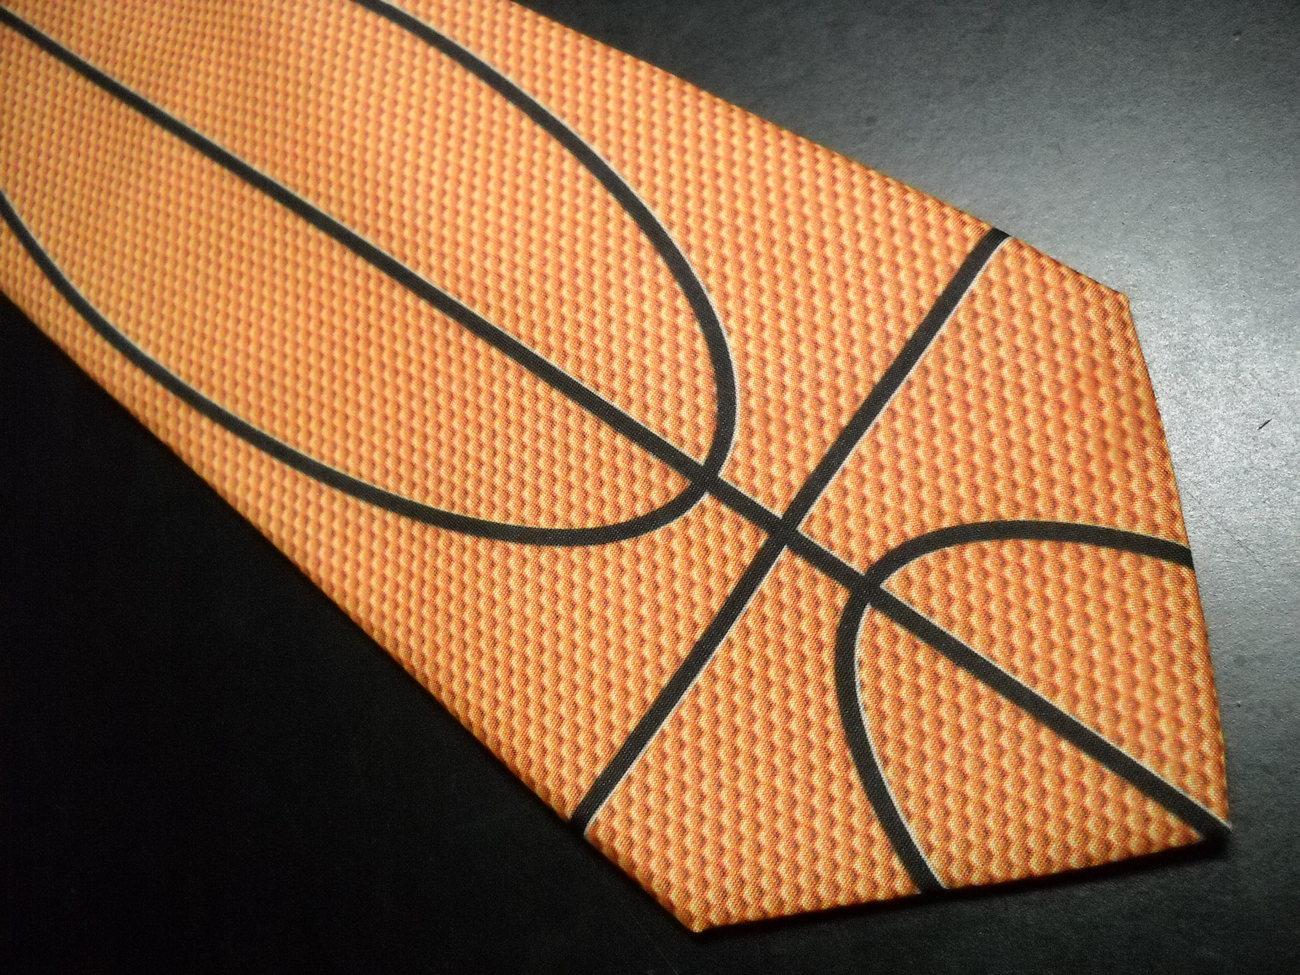 Ralph Marlin Neck Tie WallyWear BasketBall Skin 1997 Flattened Basketball Cover